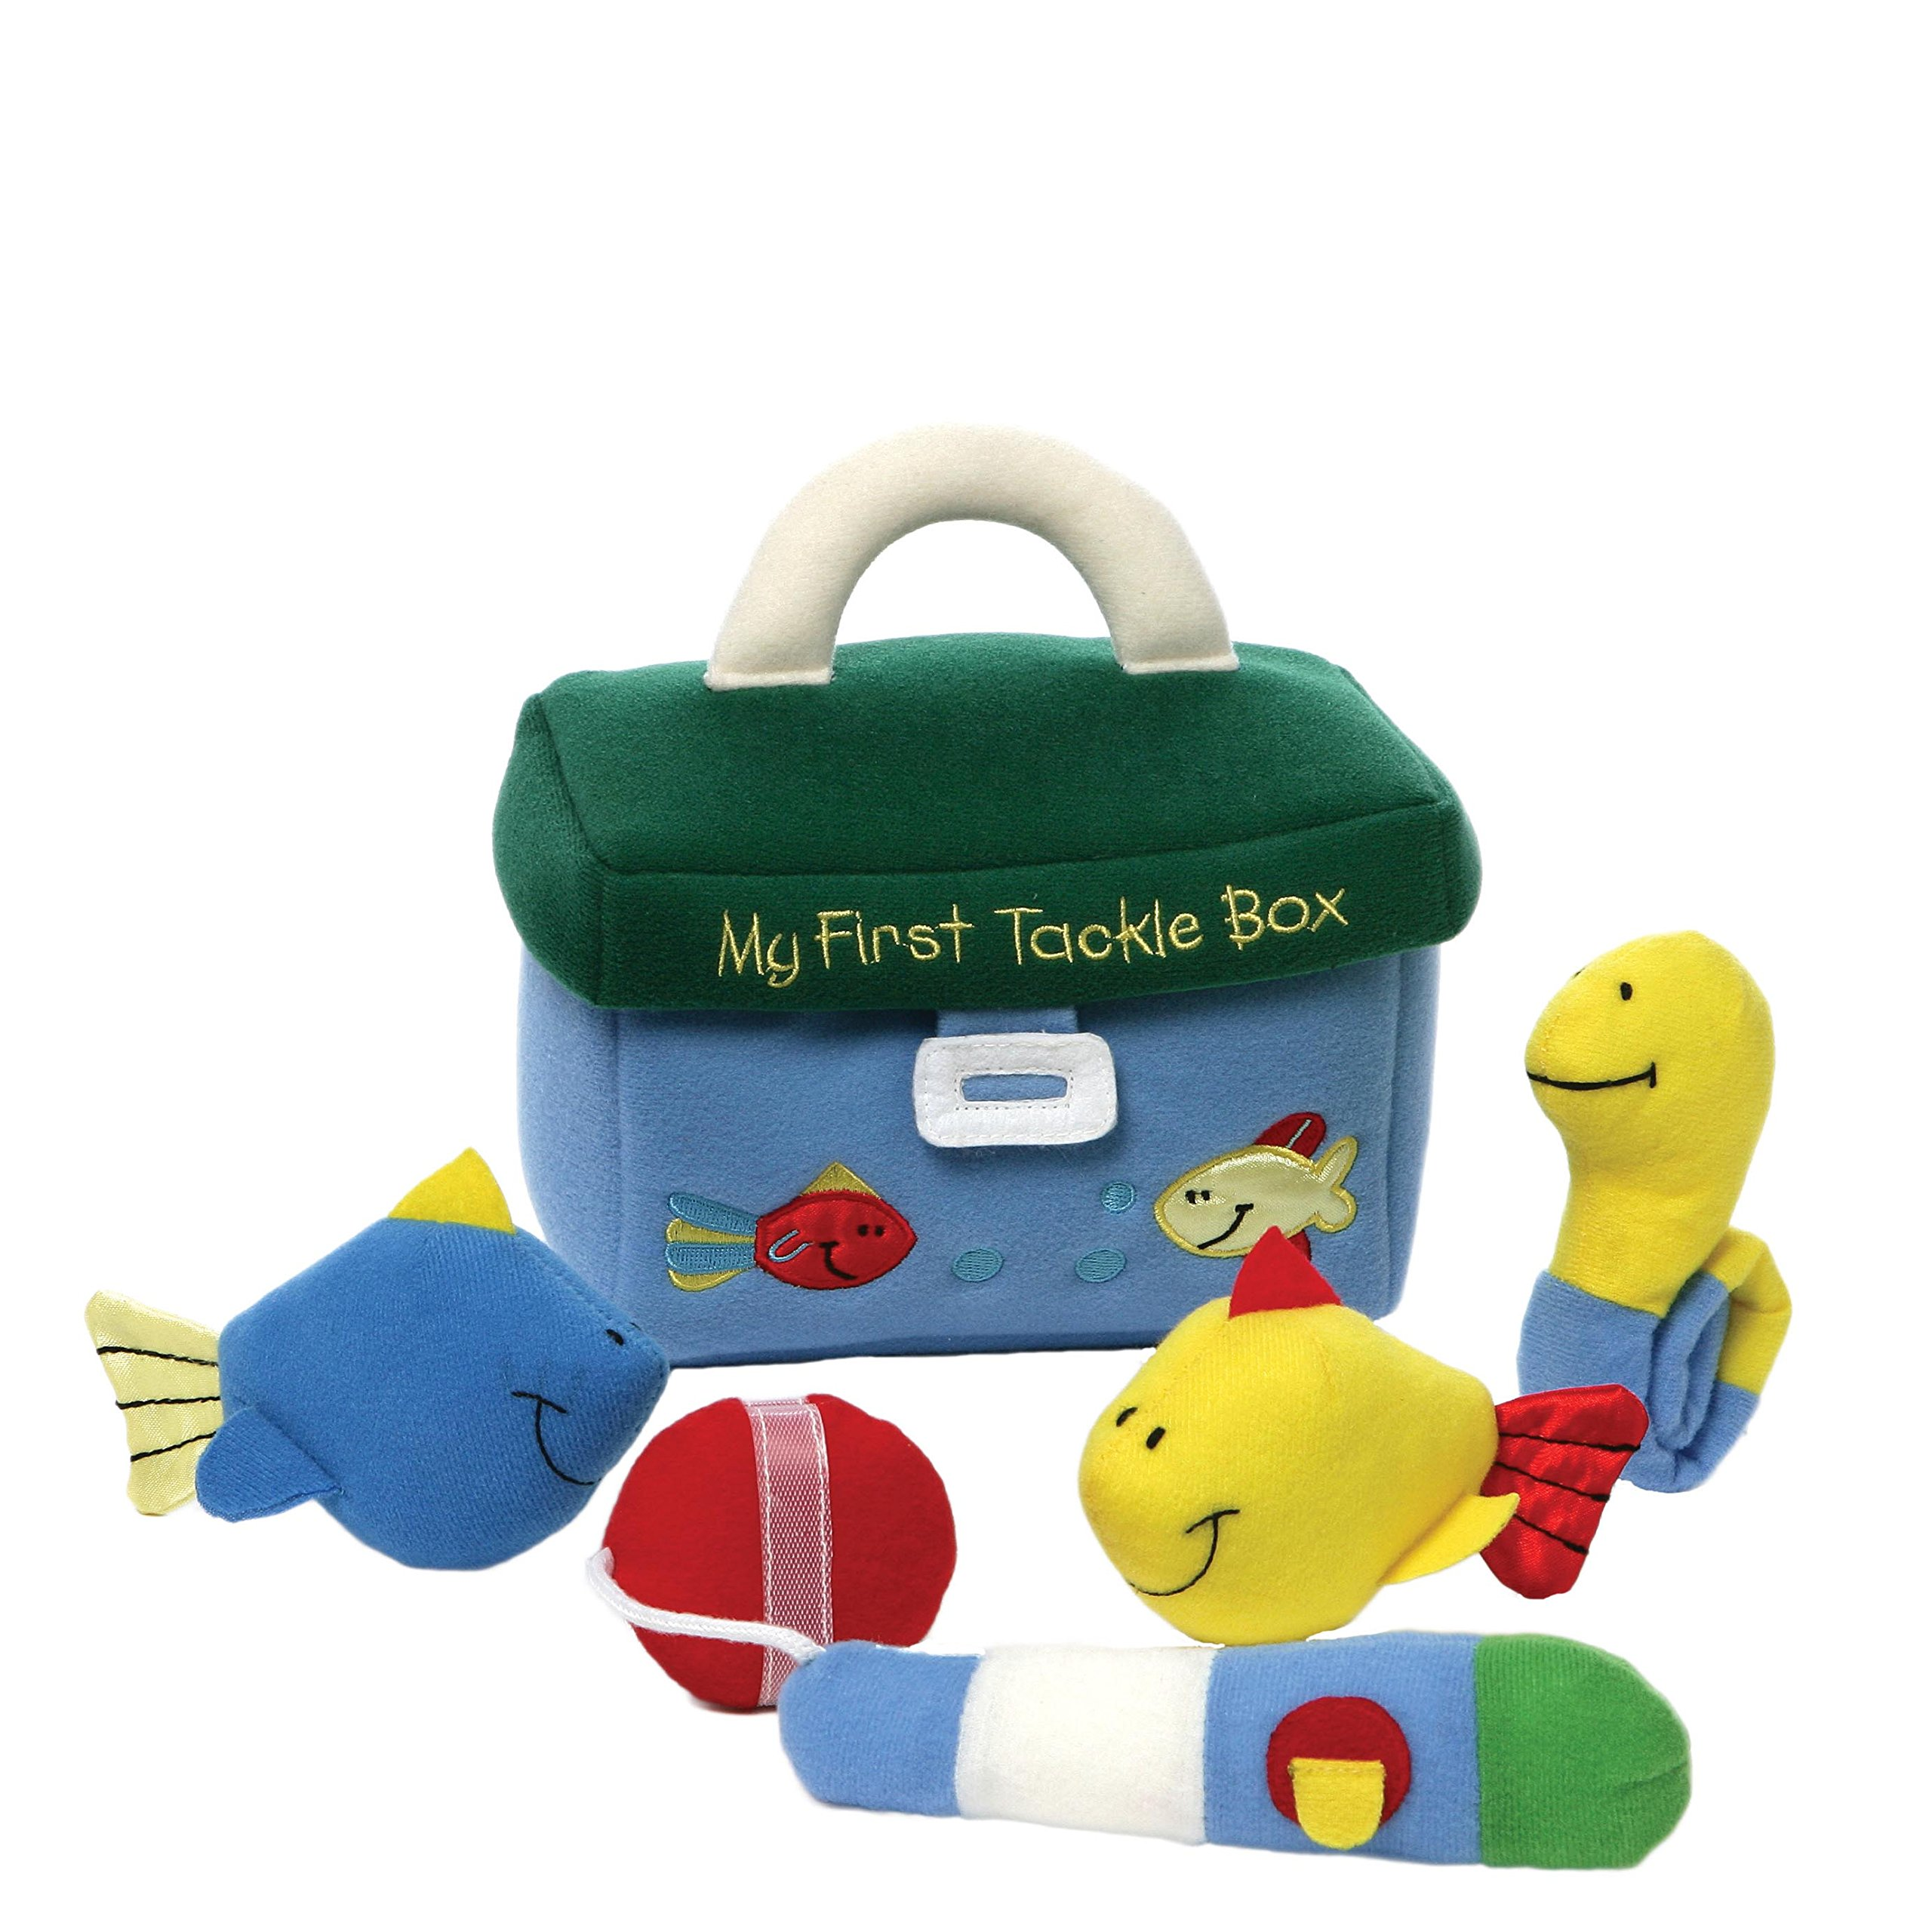 Baby GUND My First Tackle Box Stuffed Plush Playset, 5 pieces by GUND